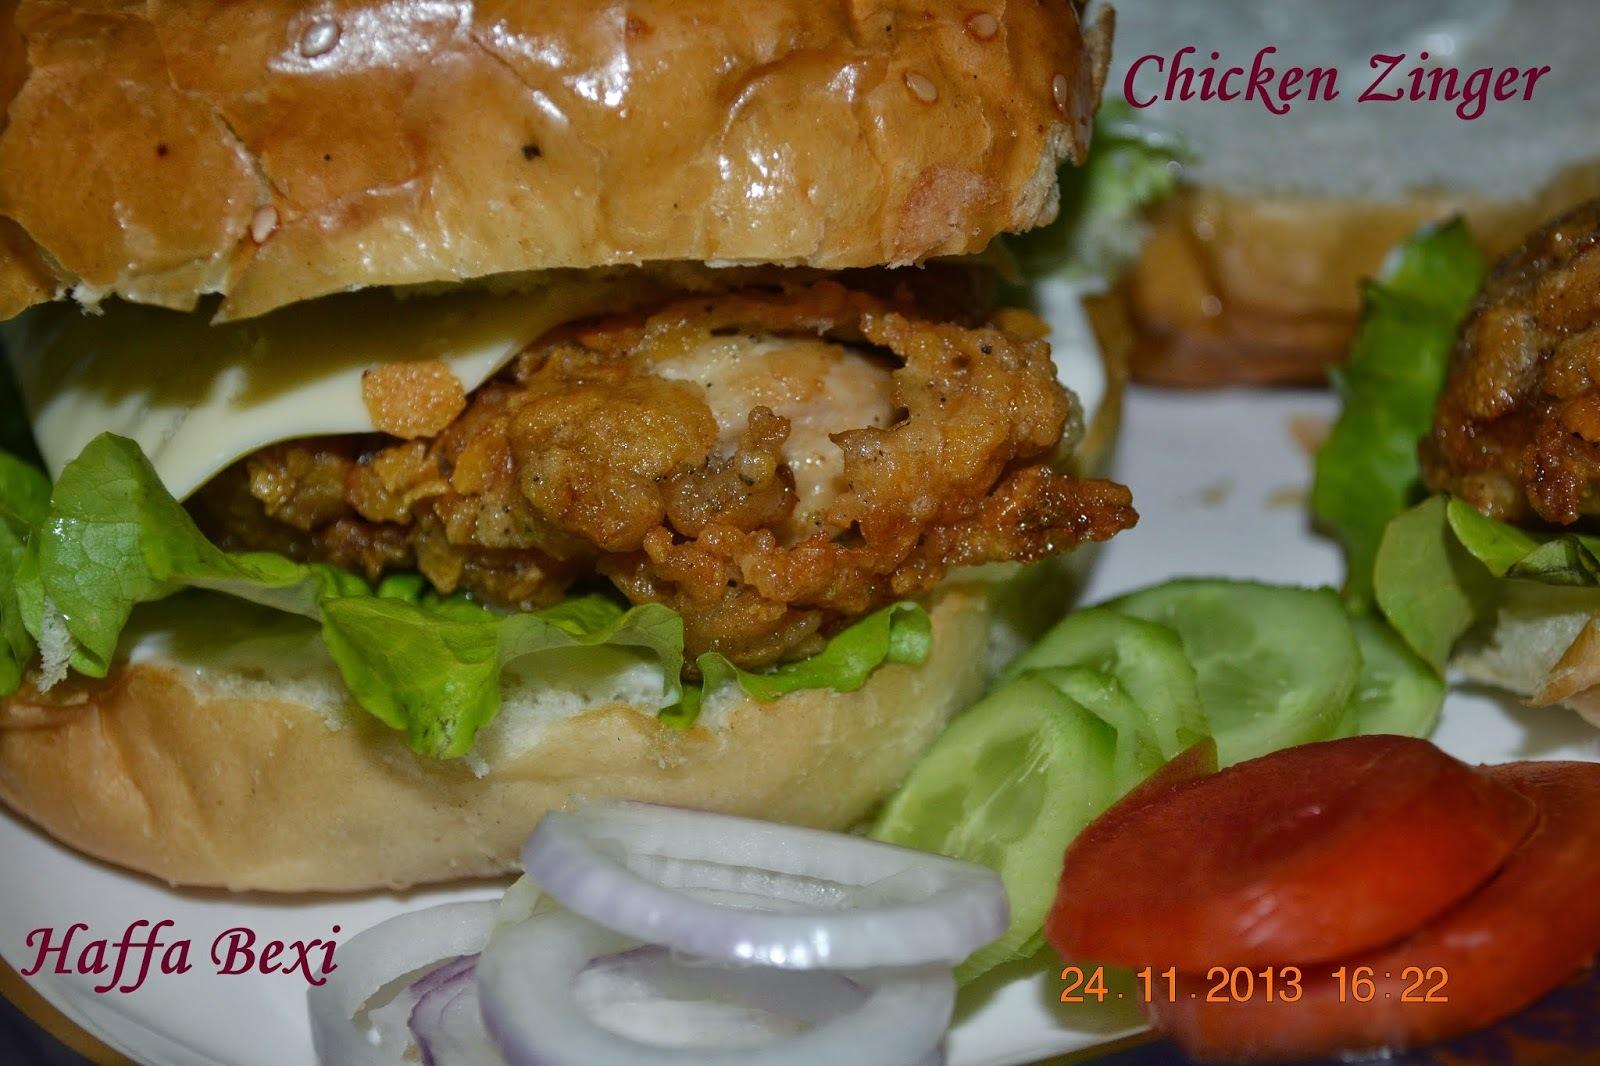 Chicken Zinger burger (KFC style)